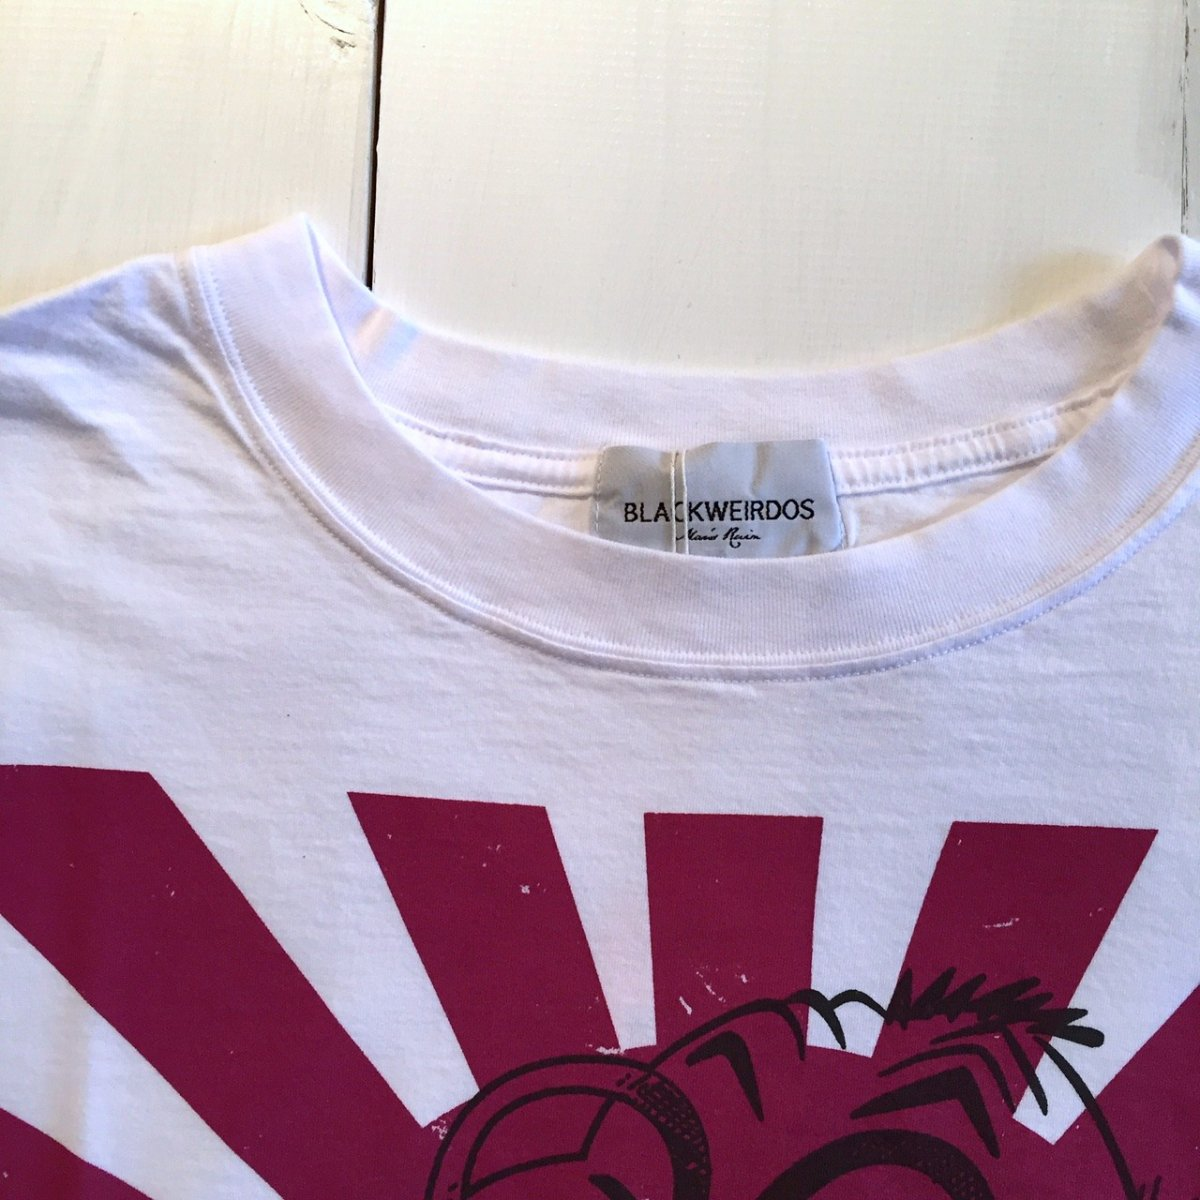 <img class='new_mark_img1' src='https://img.shop-pro.jp/img/new/icons3.gif' style='border:none;display:inline;margin:0px;padding:0px;width:auto;' />Black Weirdos  ブラック ウィドー / Tシャツ TEKNO JAP Tee 【WHITE】